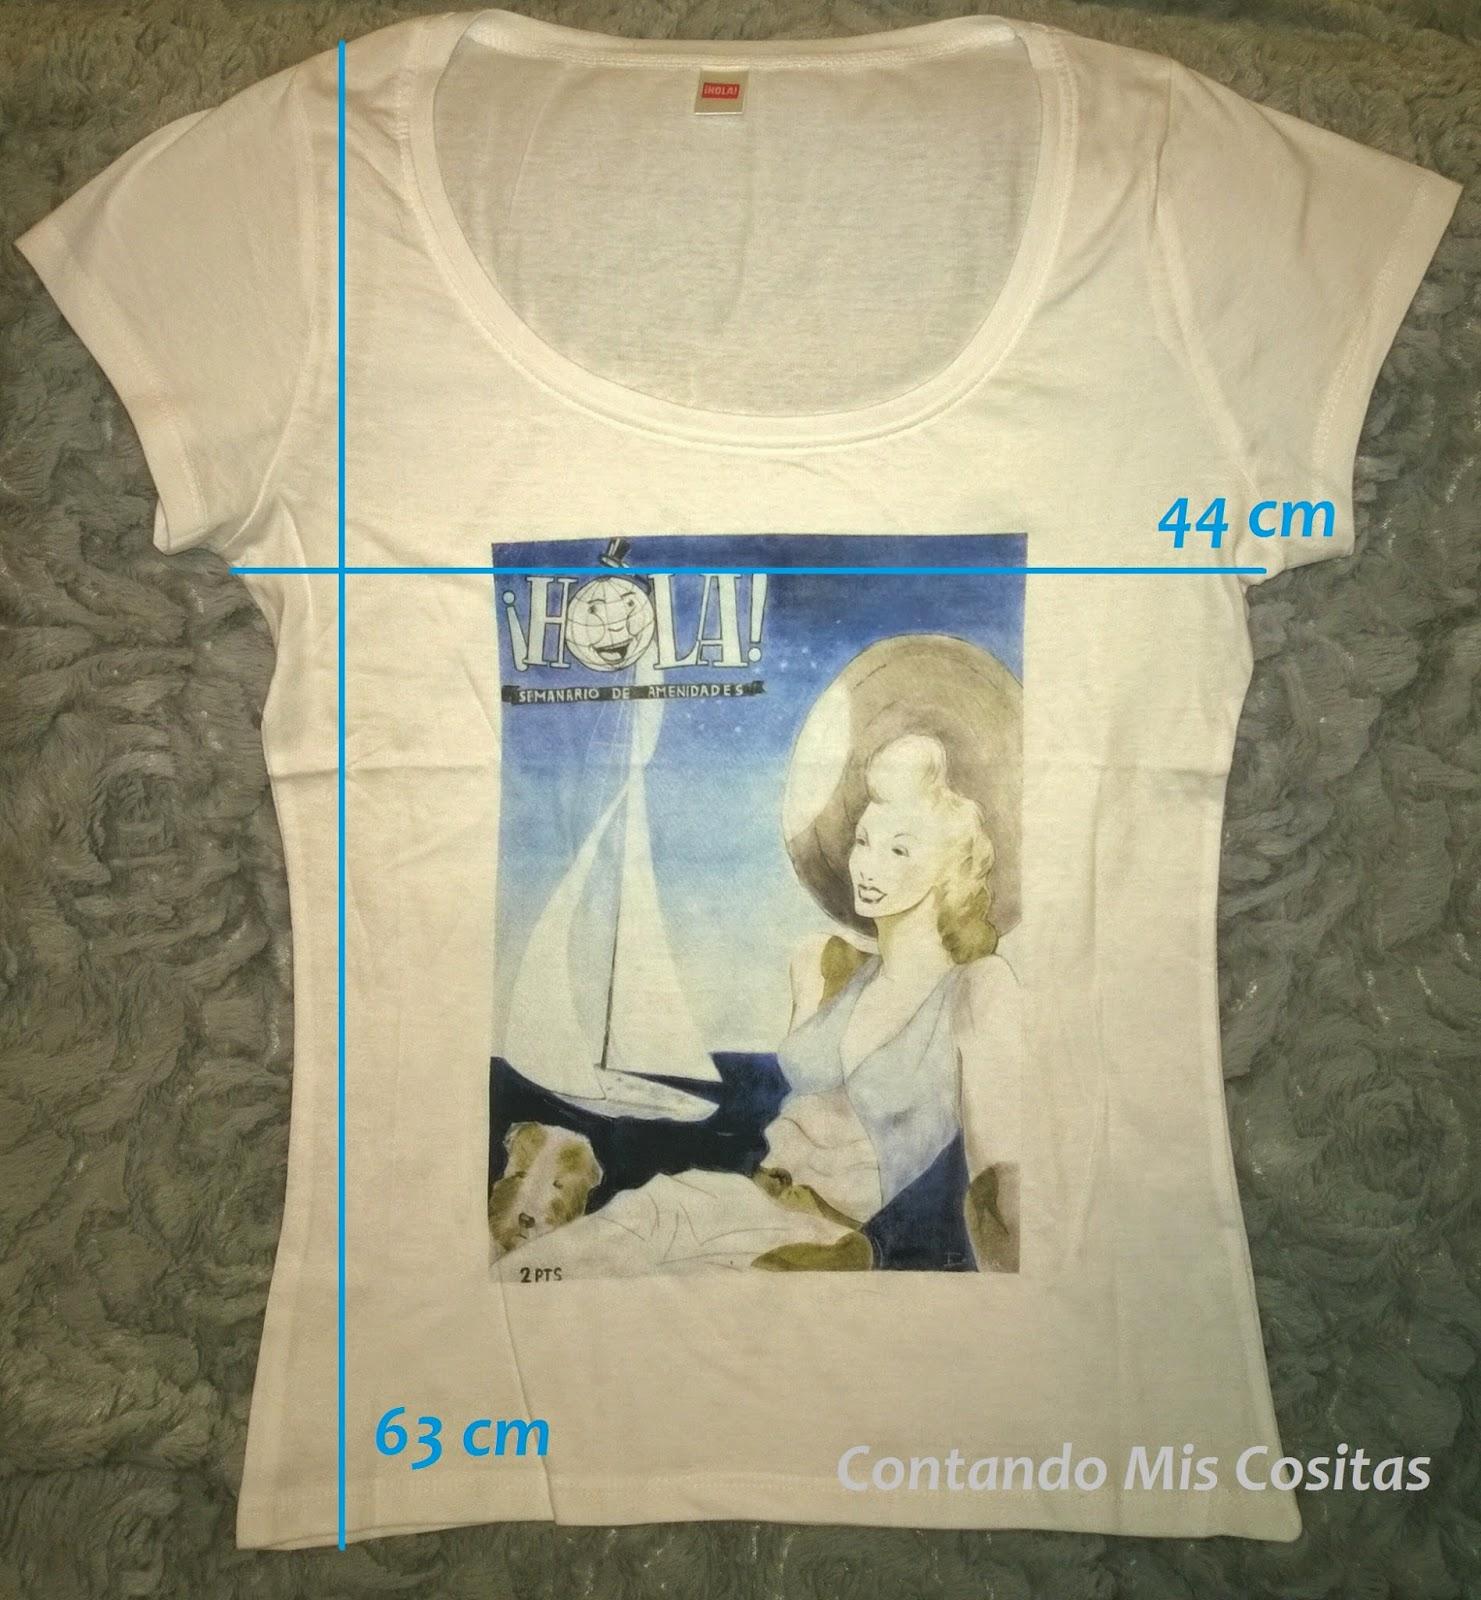 camiseta regalo revista hola marzo 2015